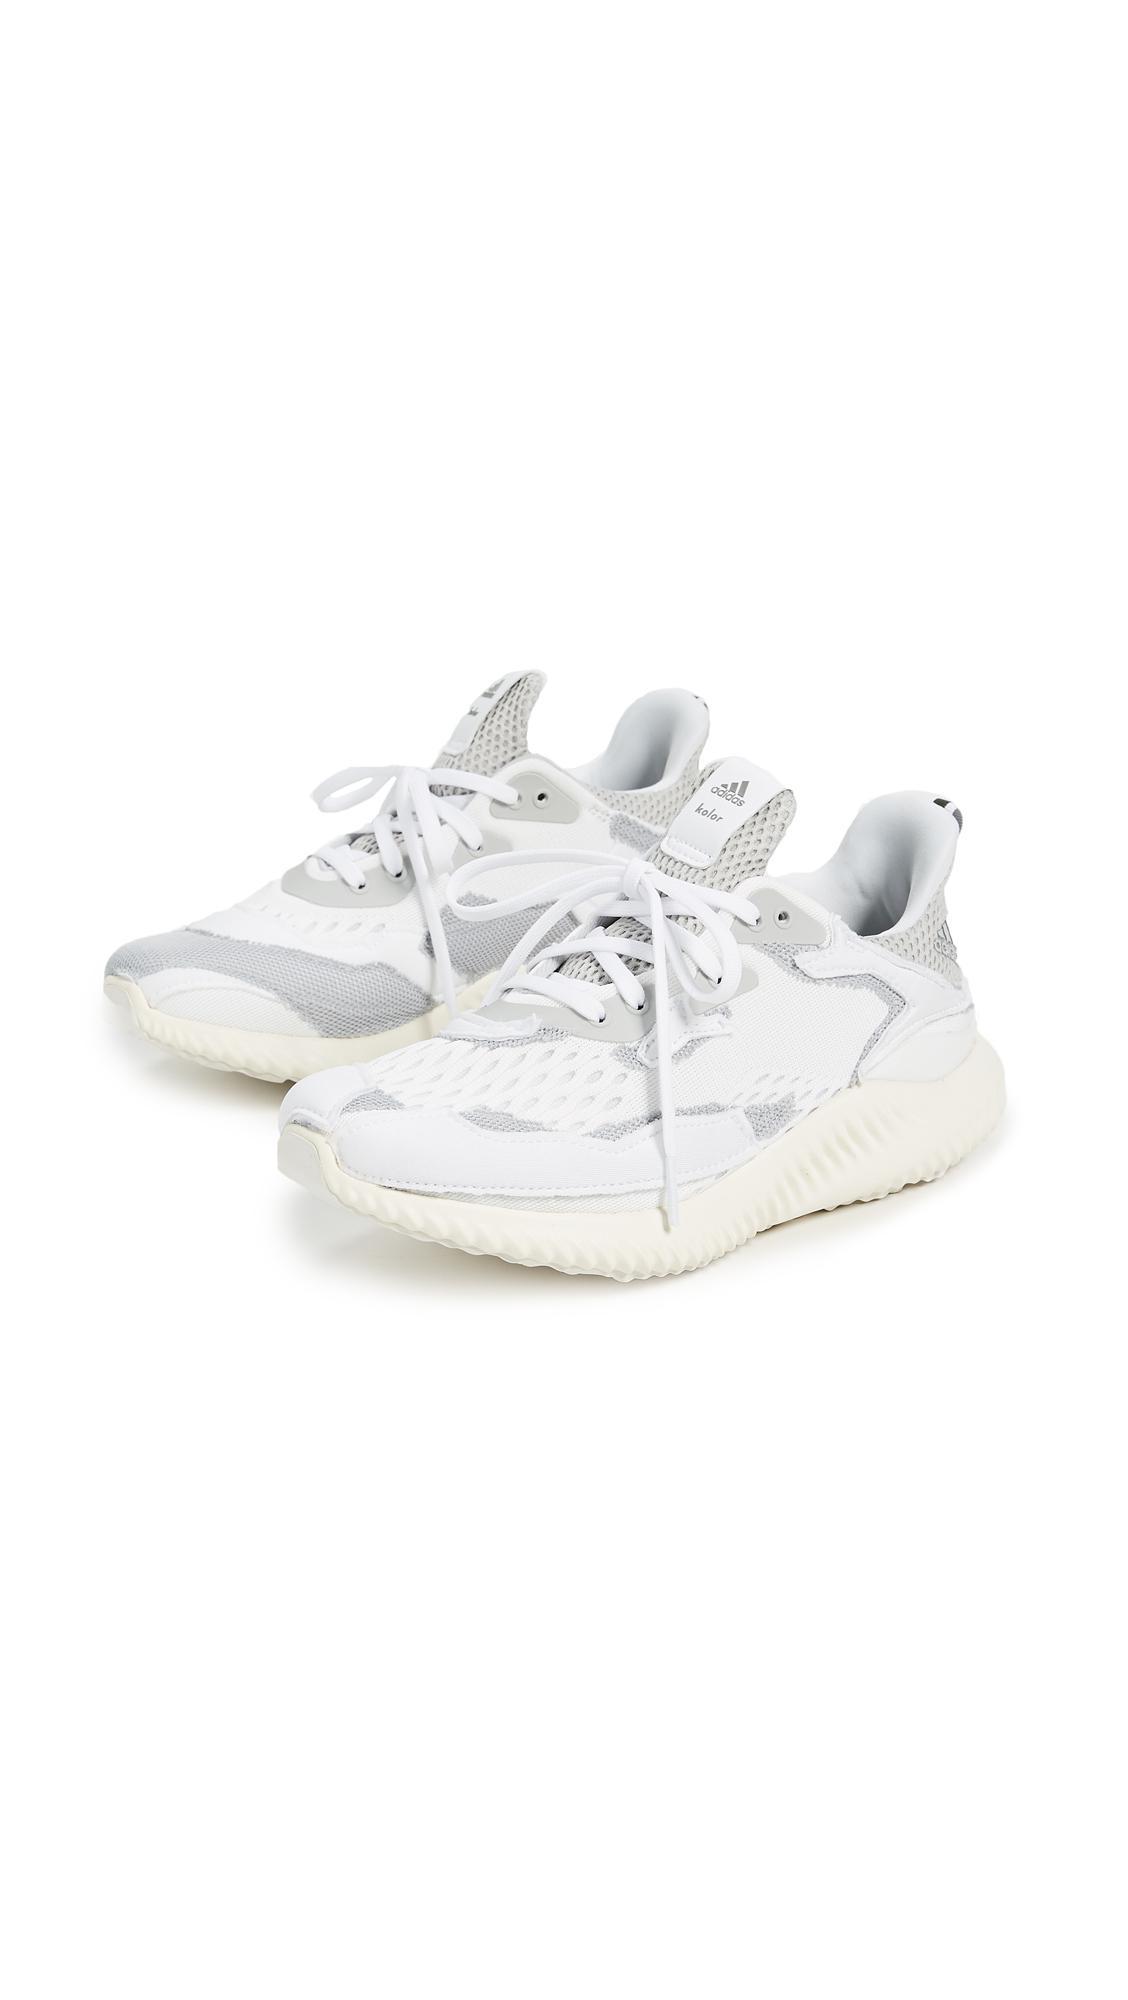 adidas Alpha Bounce Kolor Sneakers in White/Grey/White (White)